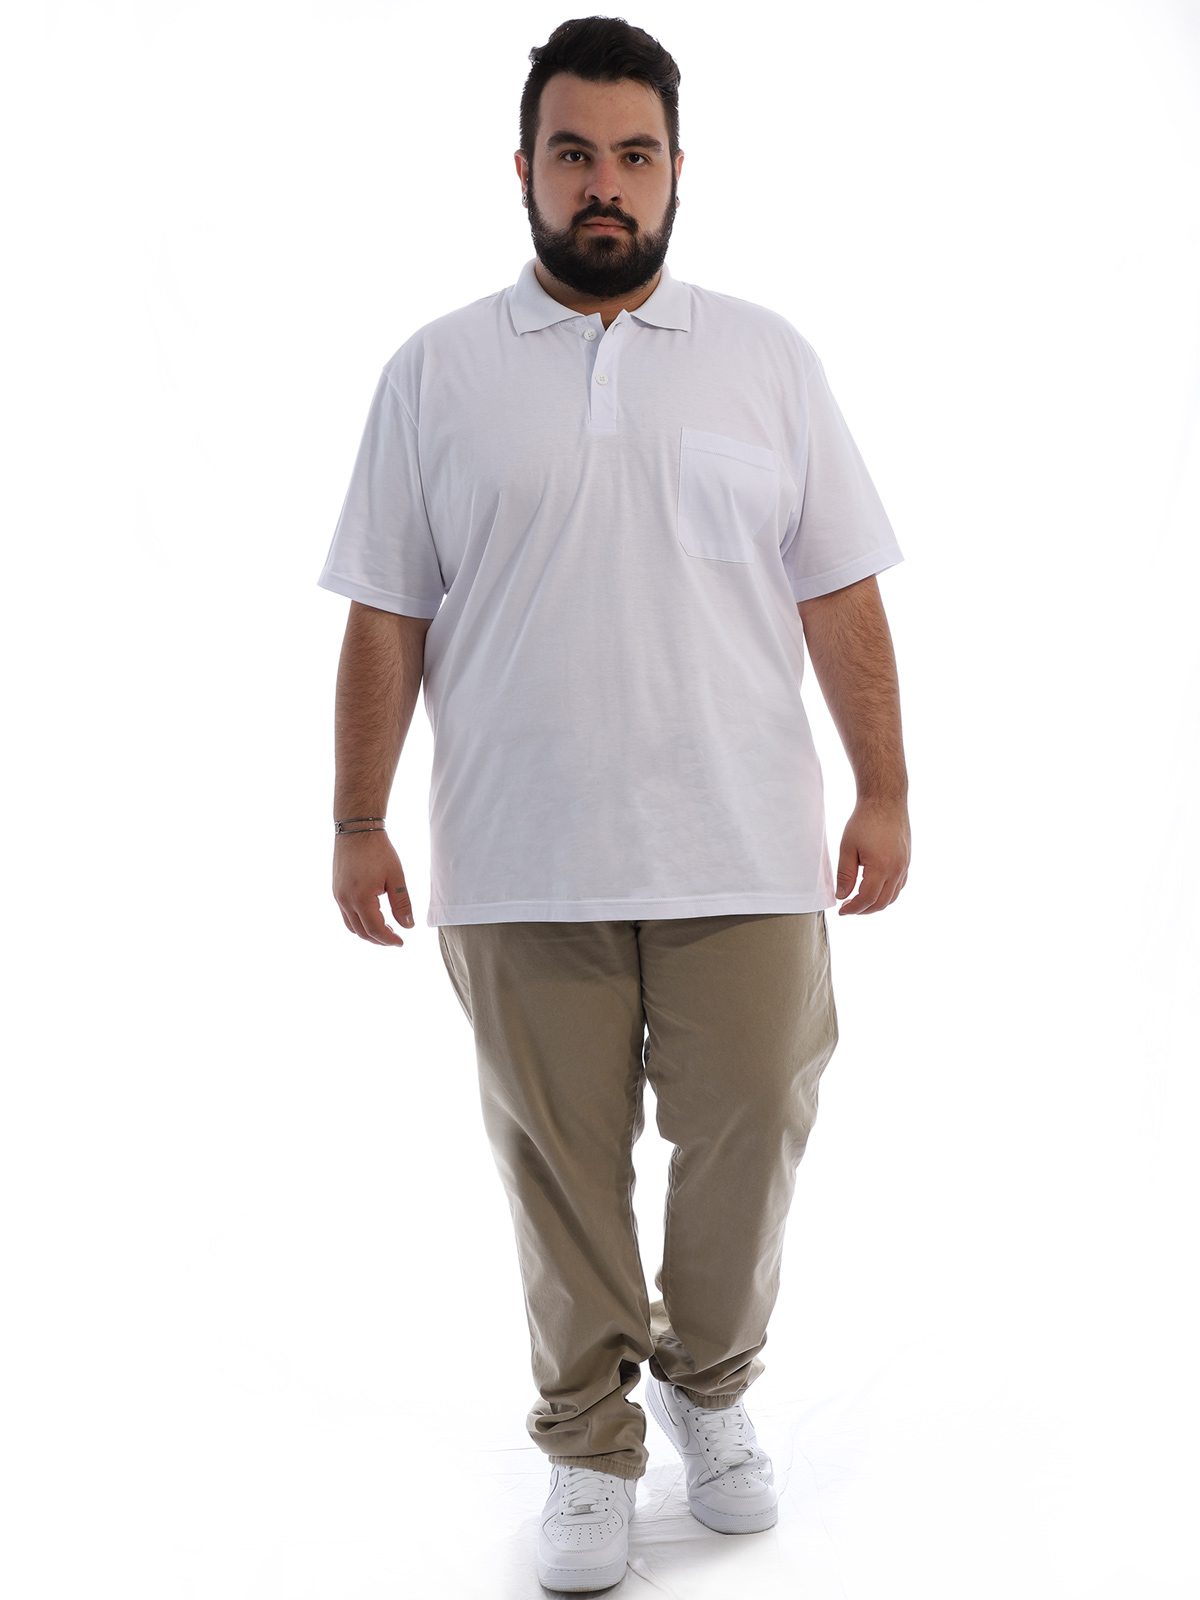 Camisa Polo Plus Size Masculina com Bolso Basica Branca